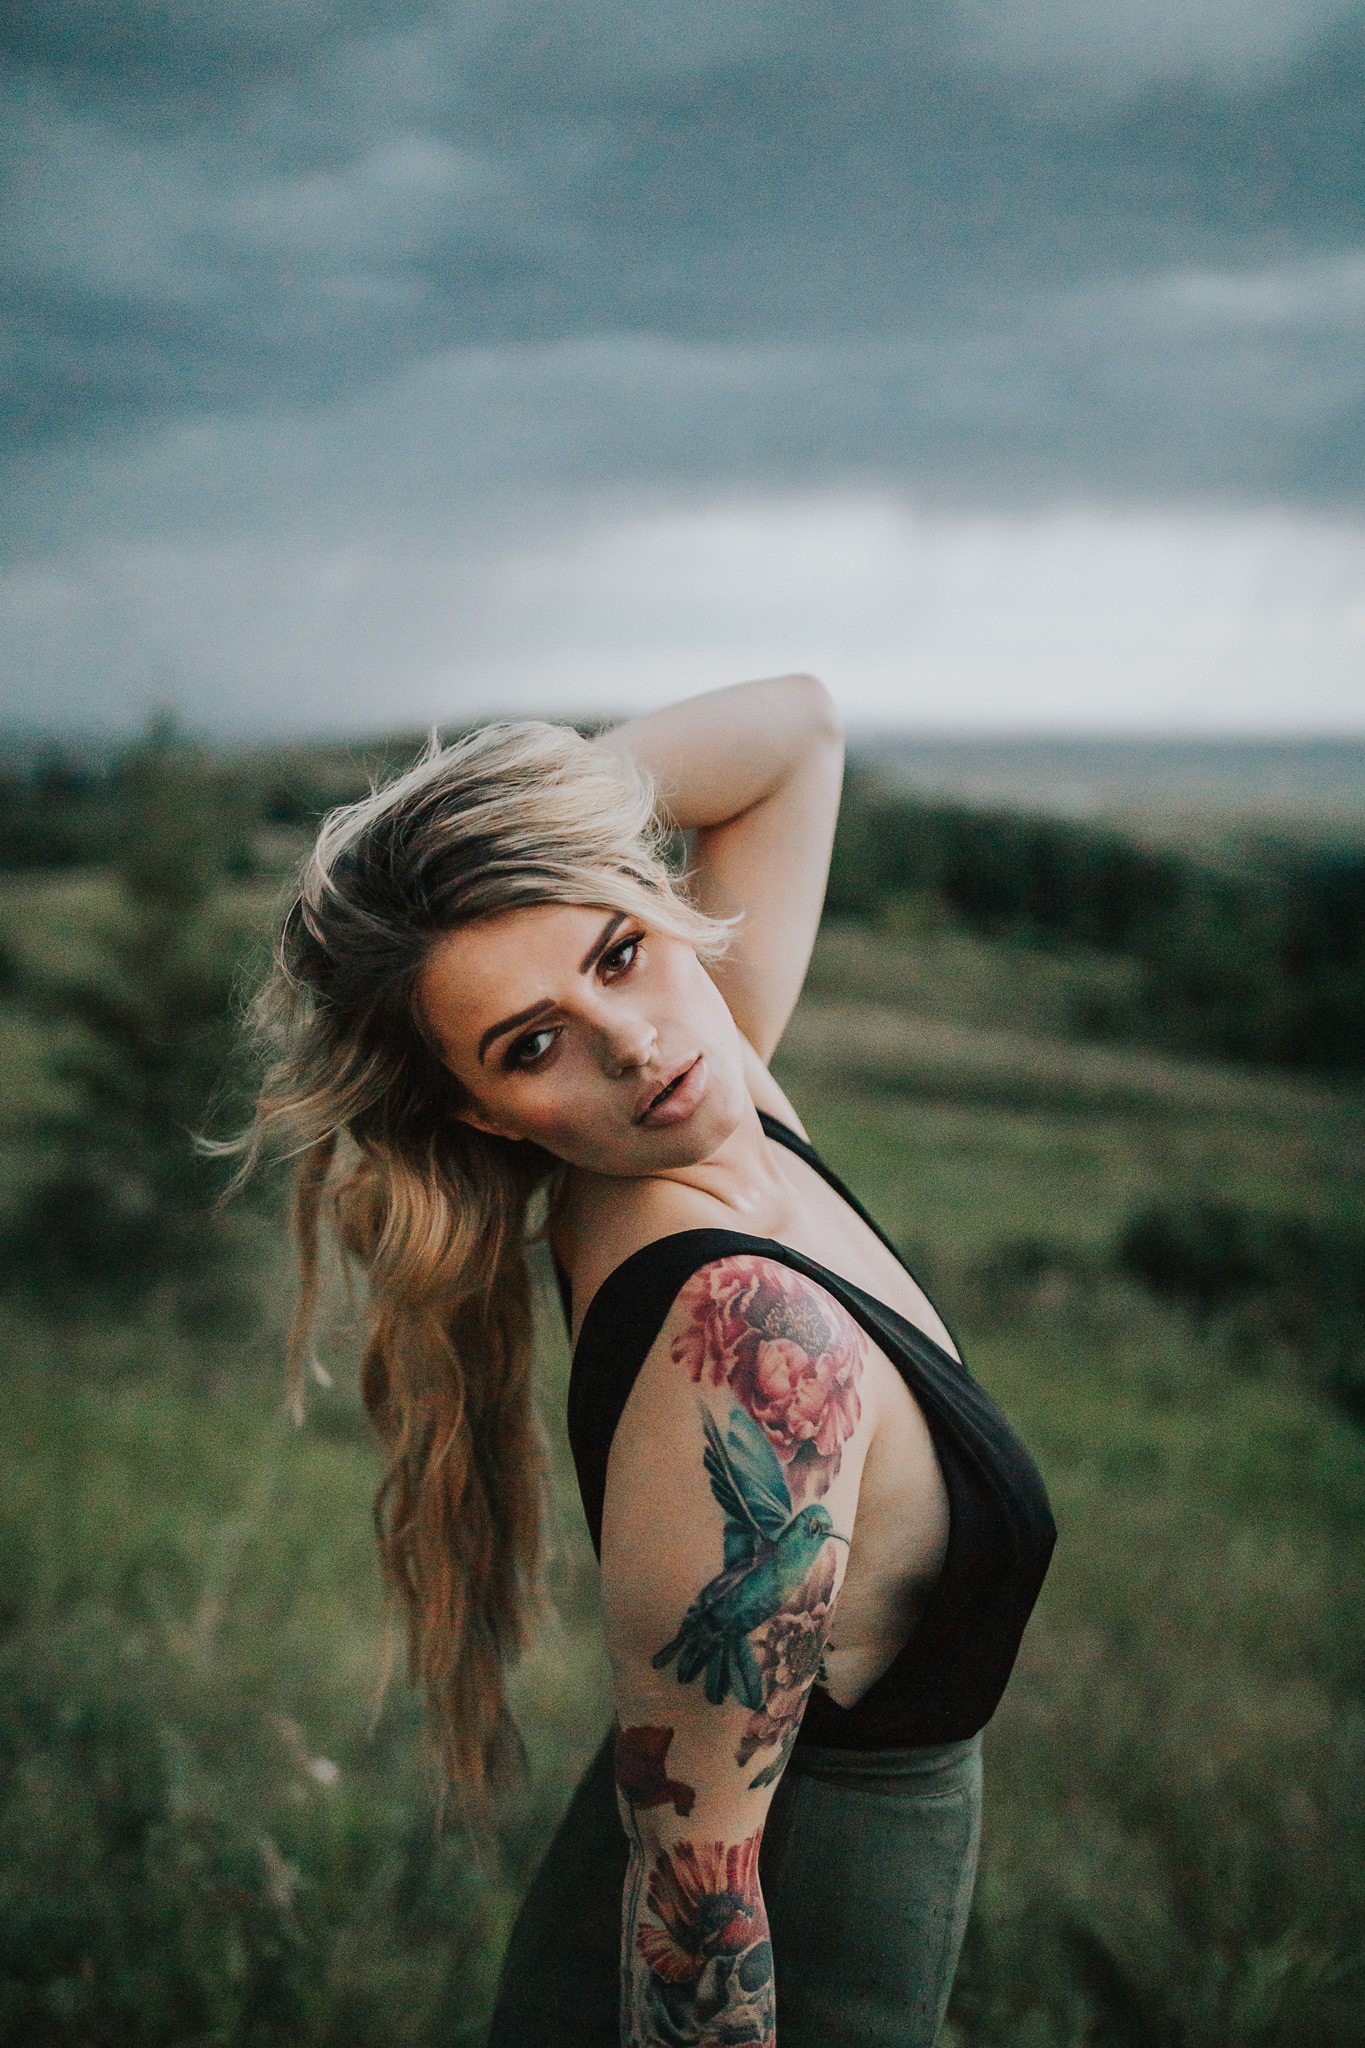 woman posing hand in hair reesor lake alberta storm portrait photography